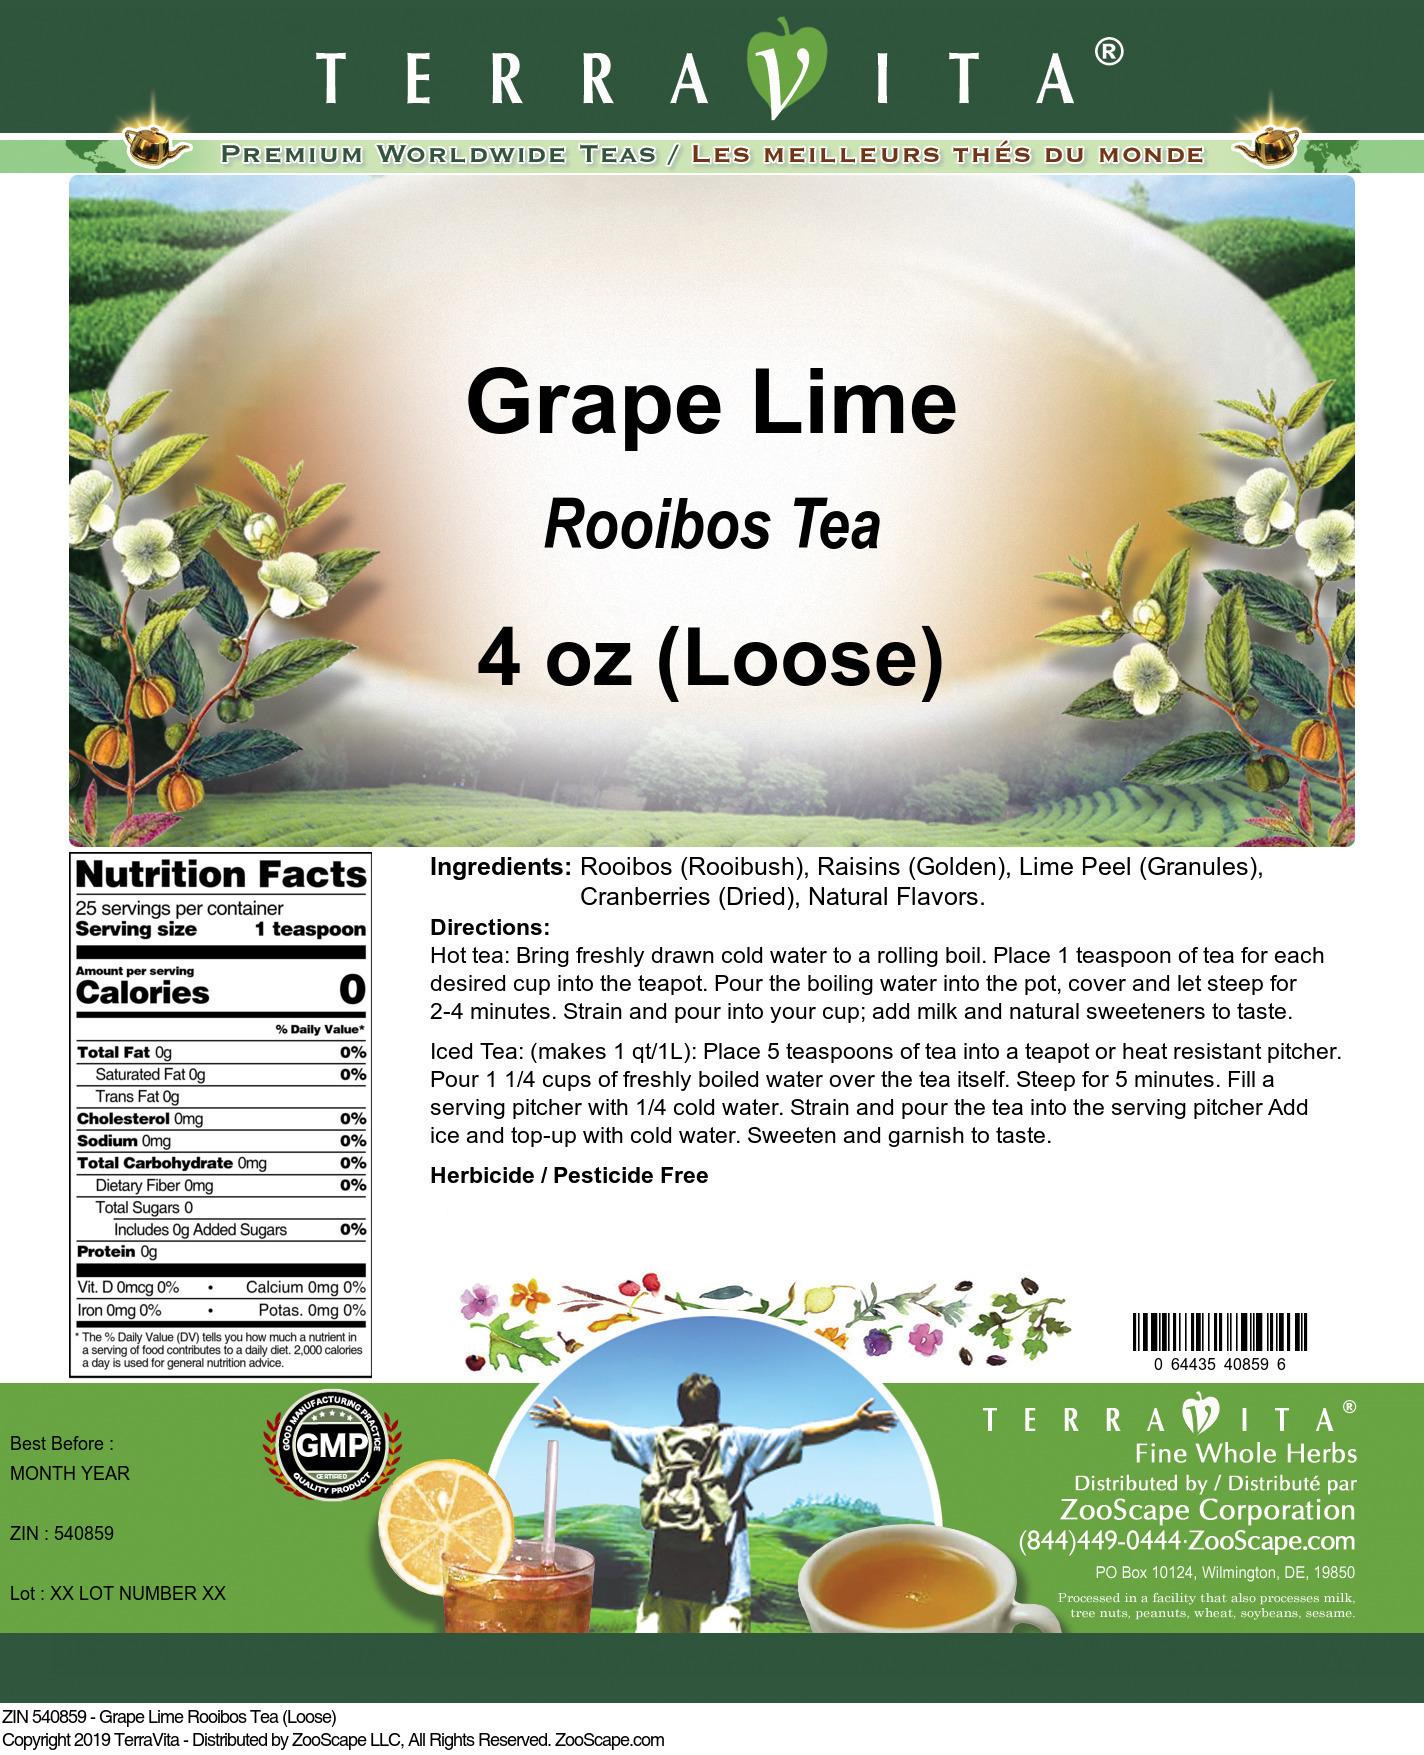 Grape Lime Rooibos Tea (Loose)